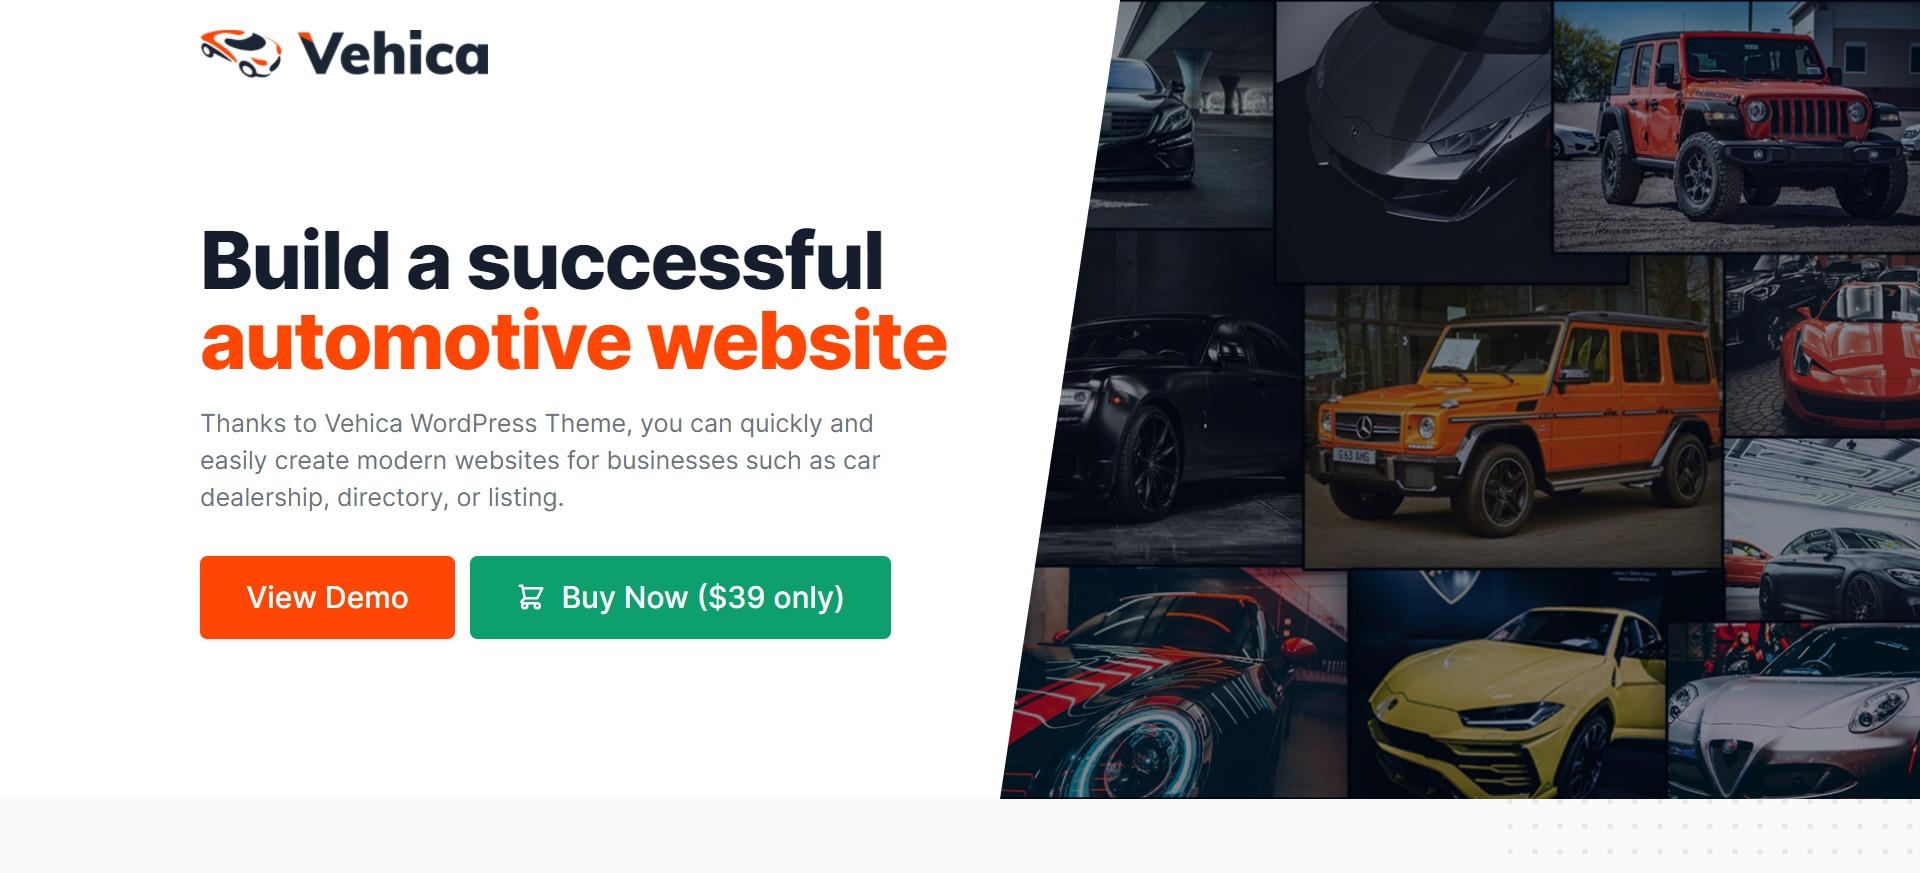 Vehica - 汽车销售商家目录黄页资源WordPress主题